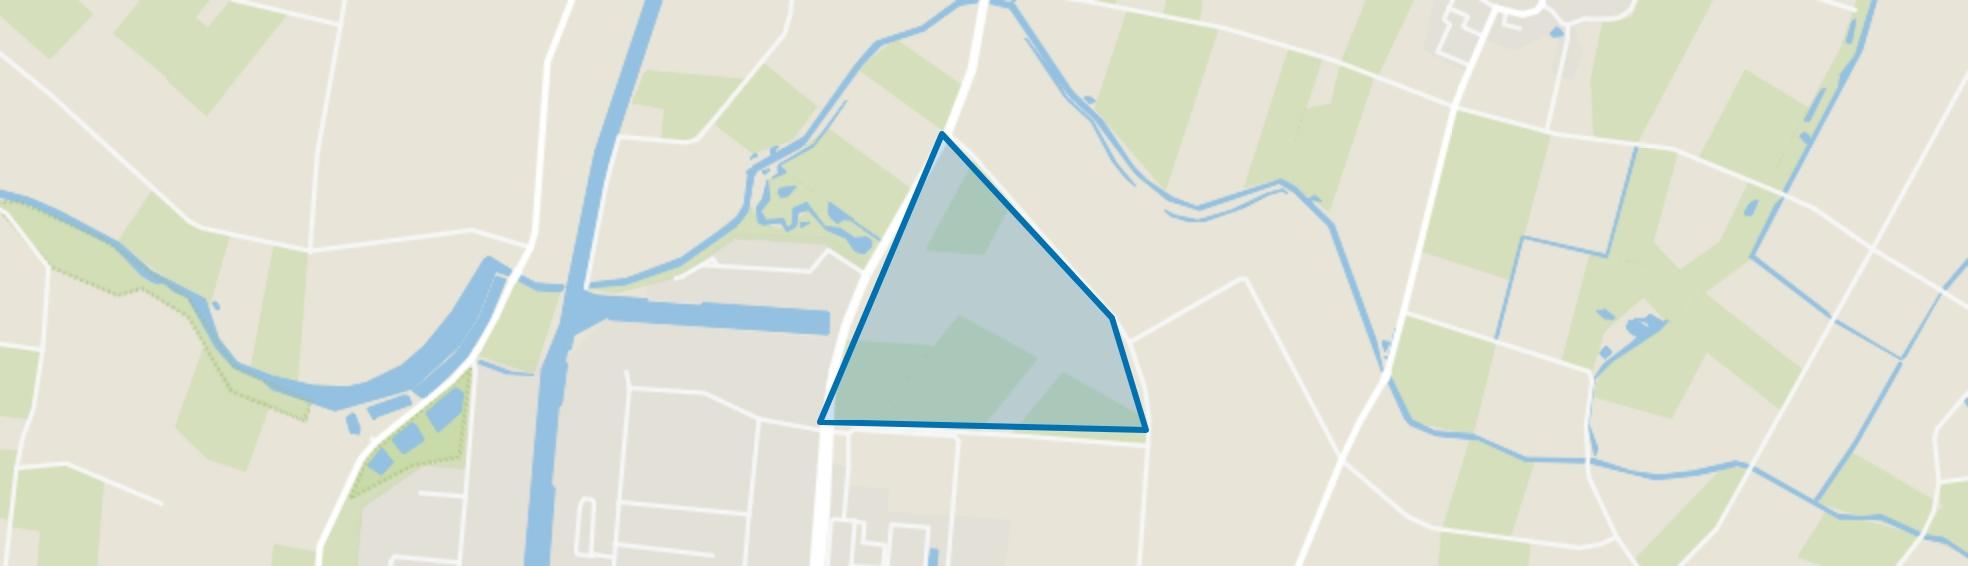 Hooimeer, Oss map